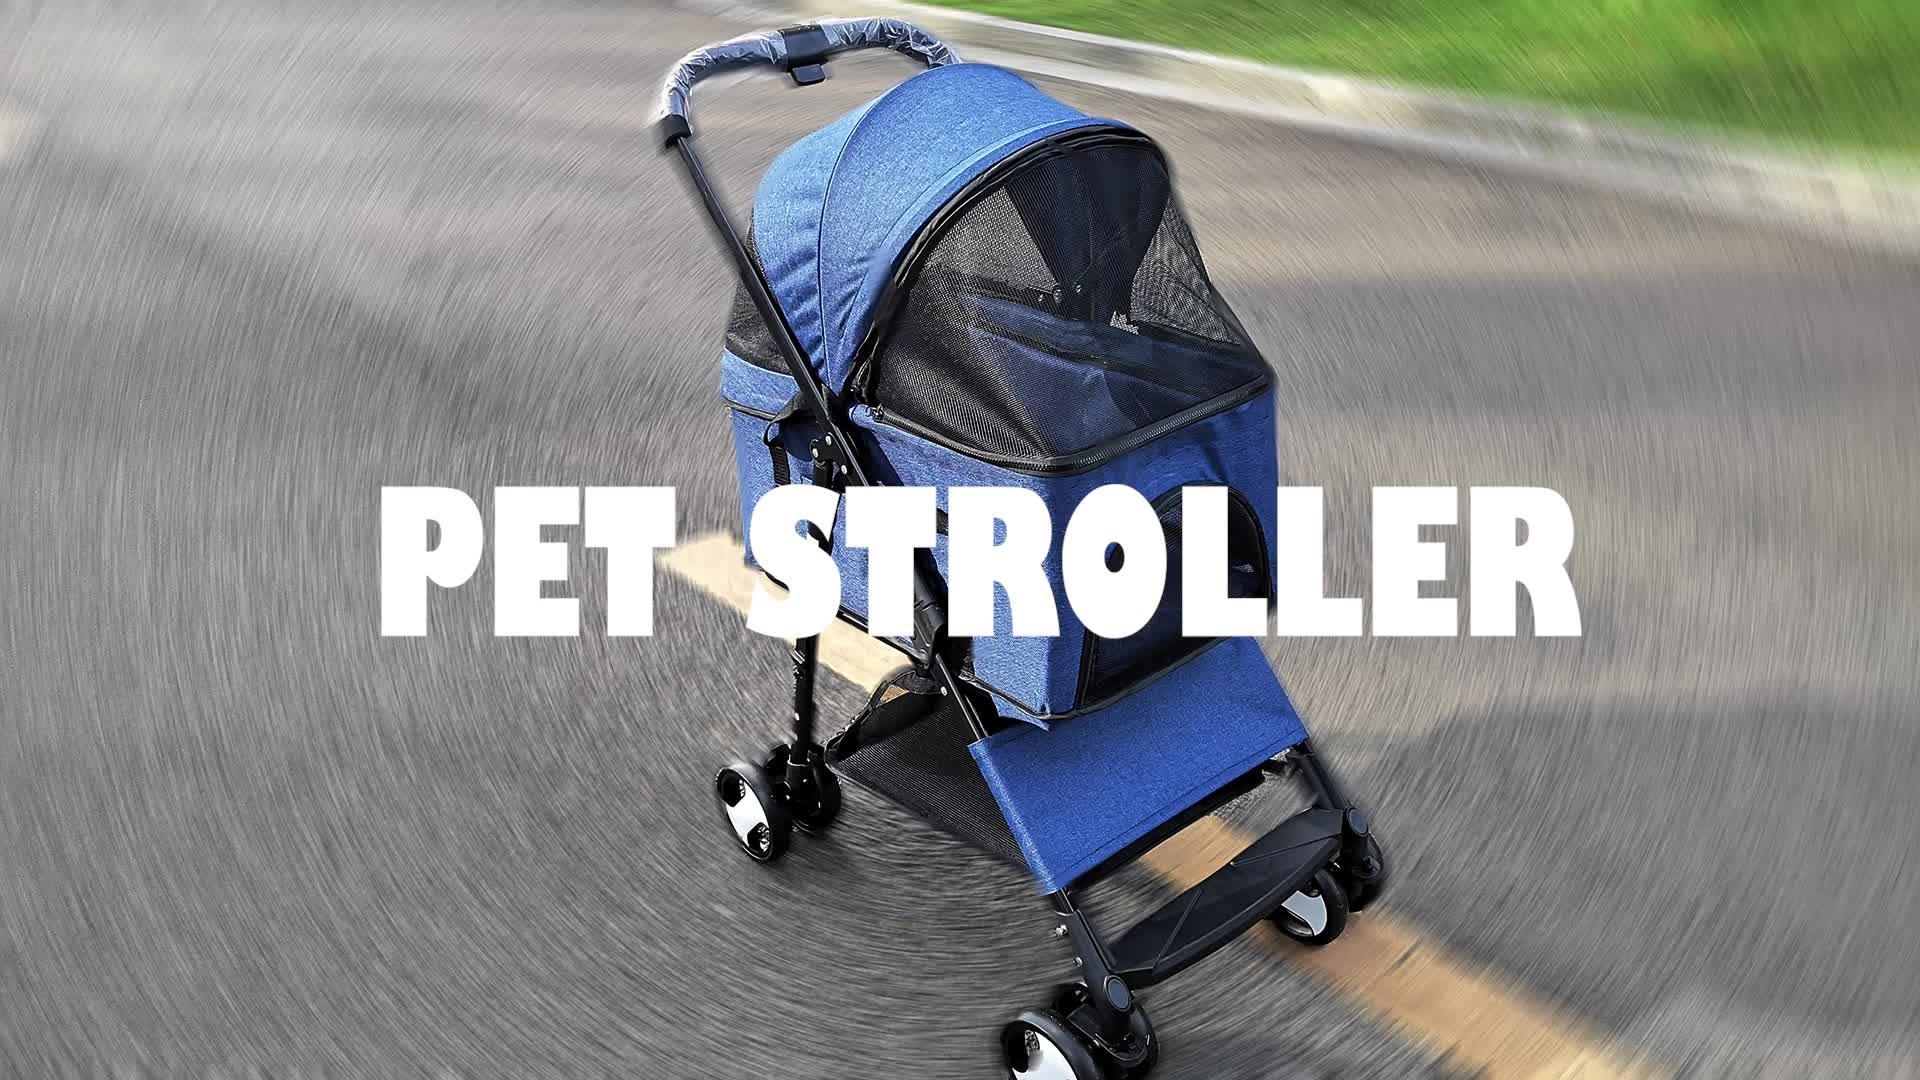 4 Wheels Dog Cat Jogger Stroller One-Click Folding Travel Pet Carrier Trolley Pet Stroller For Dogs